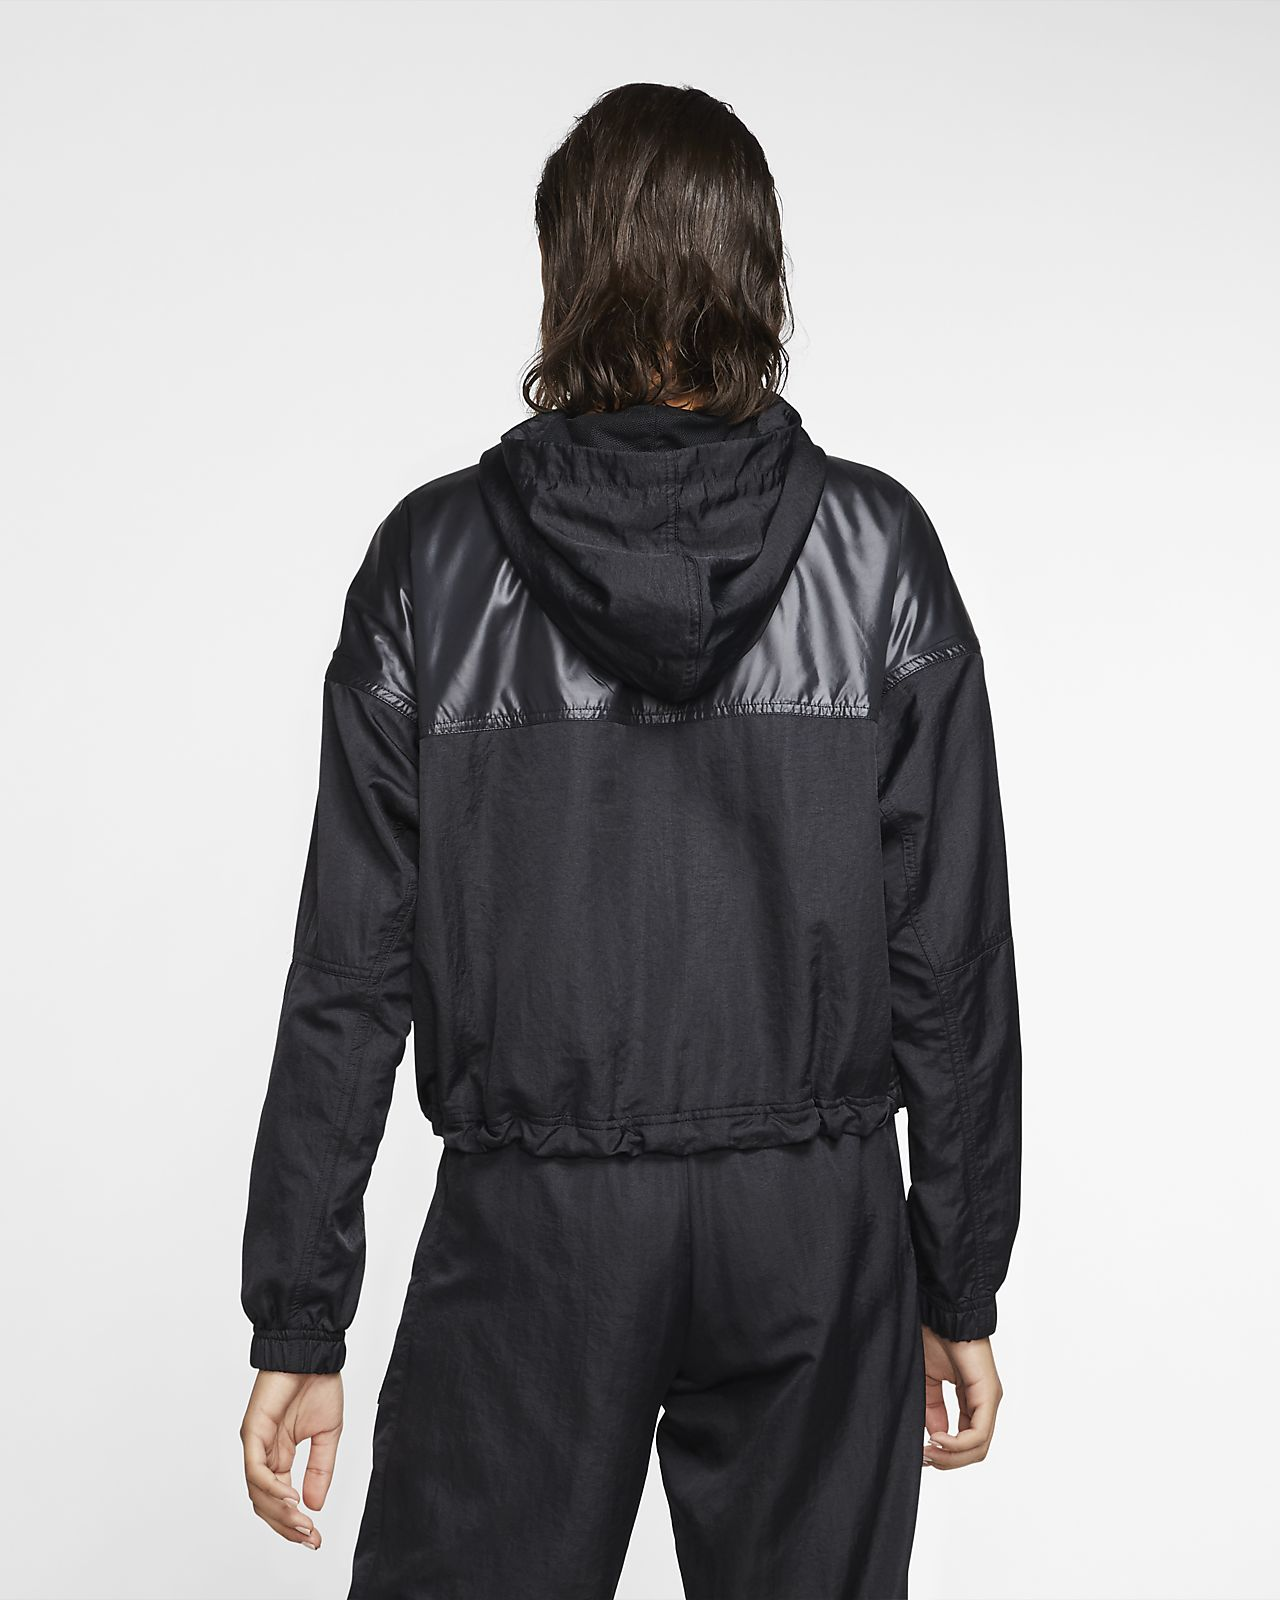 Casaco cargo Nike Sportswear Windrunner